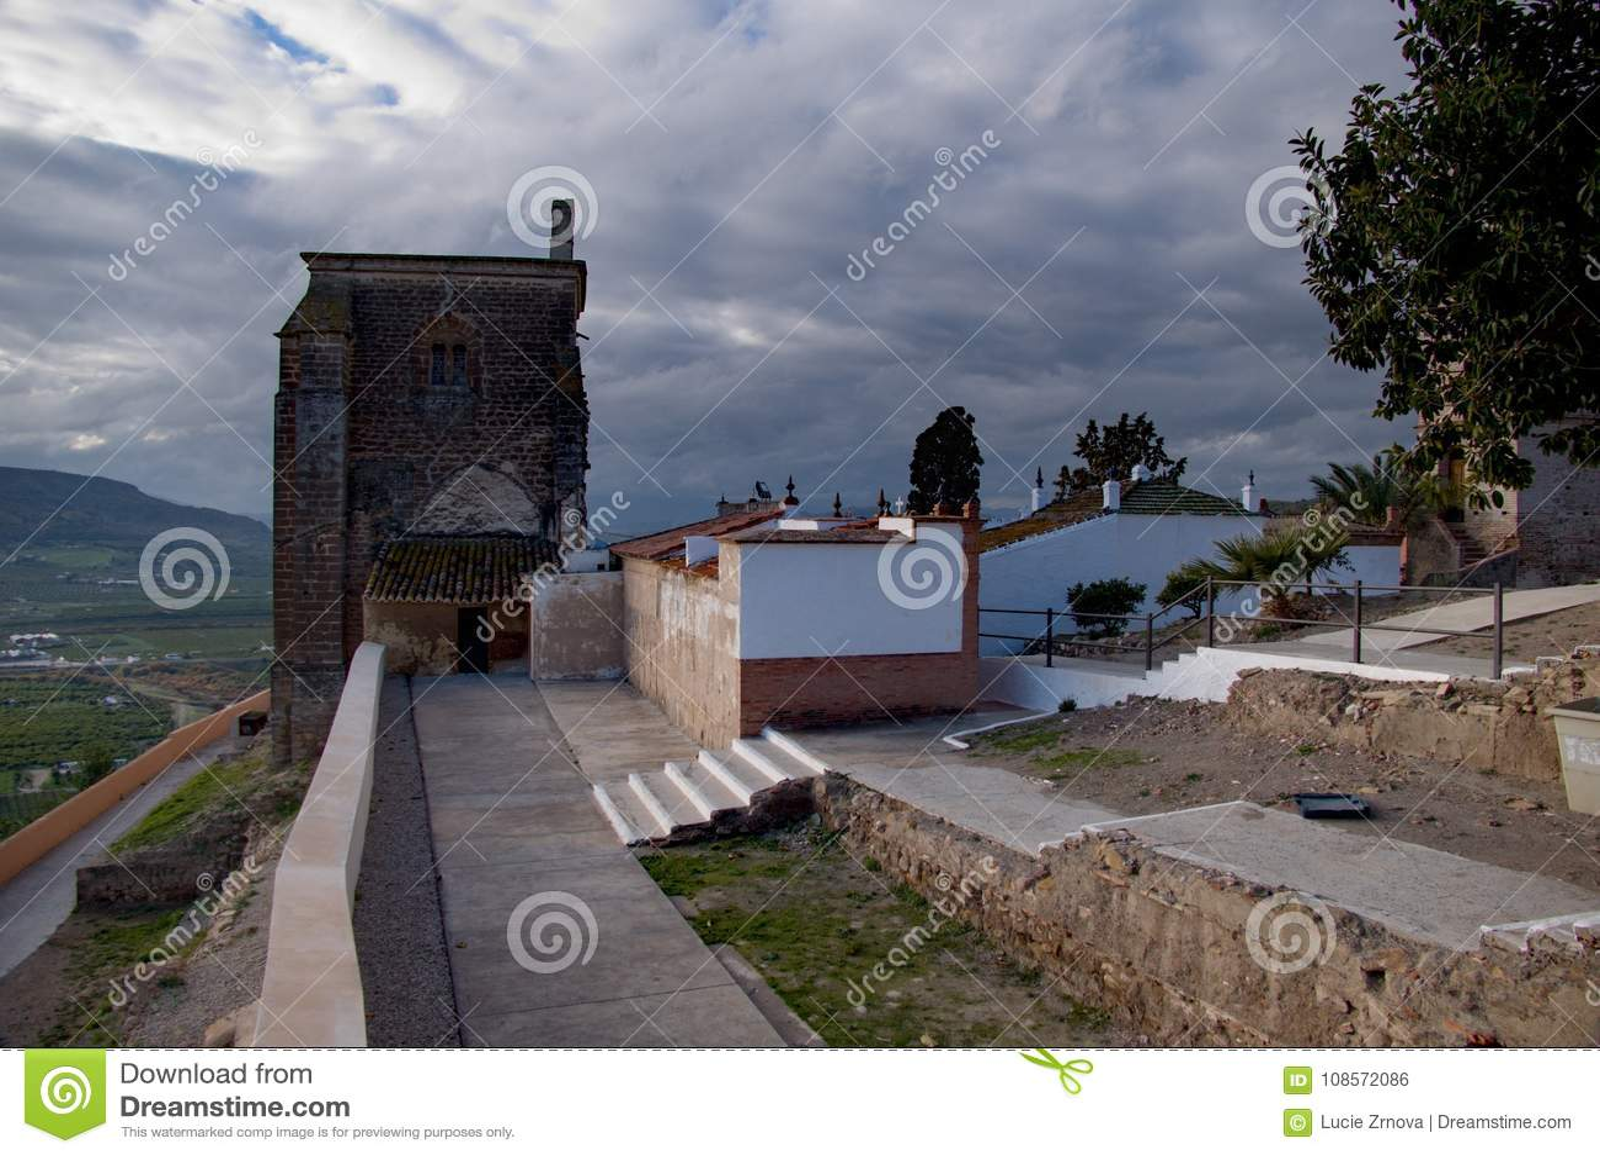 Traditional Spanish Architecture In Alora Village Stock Photo